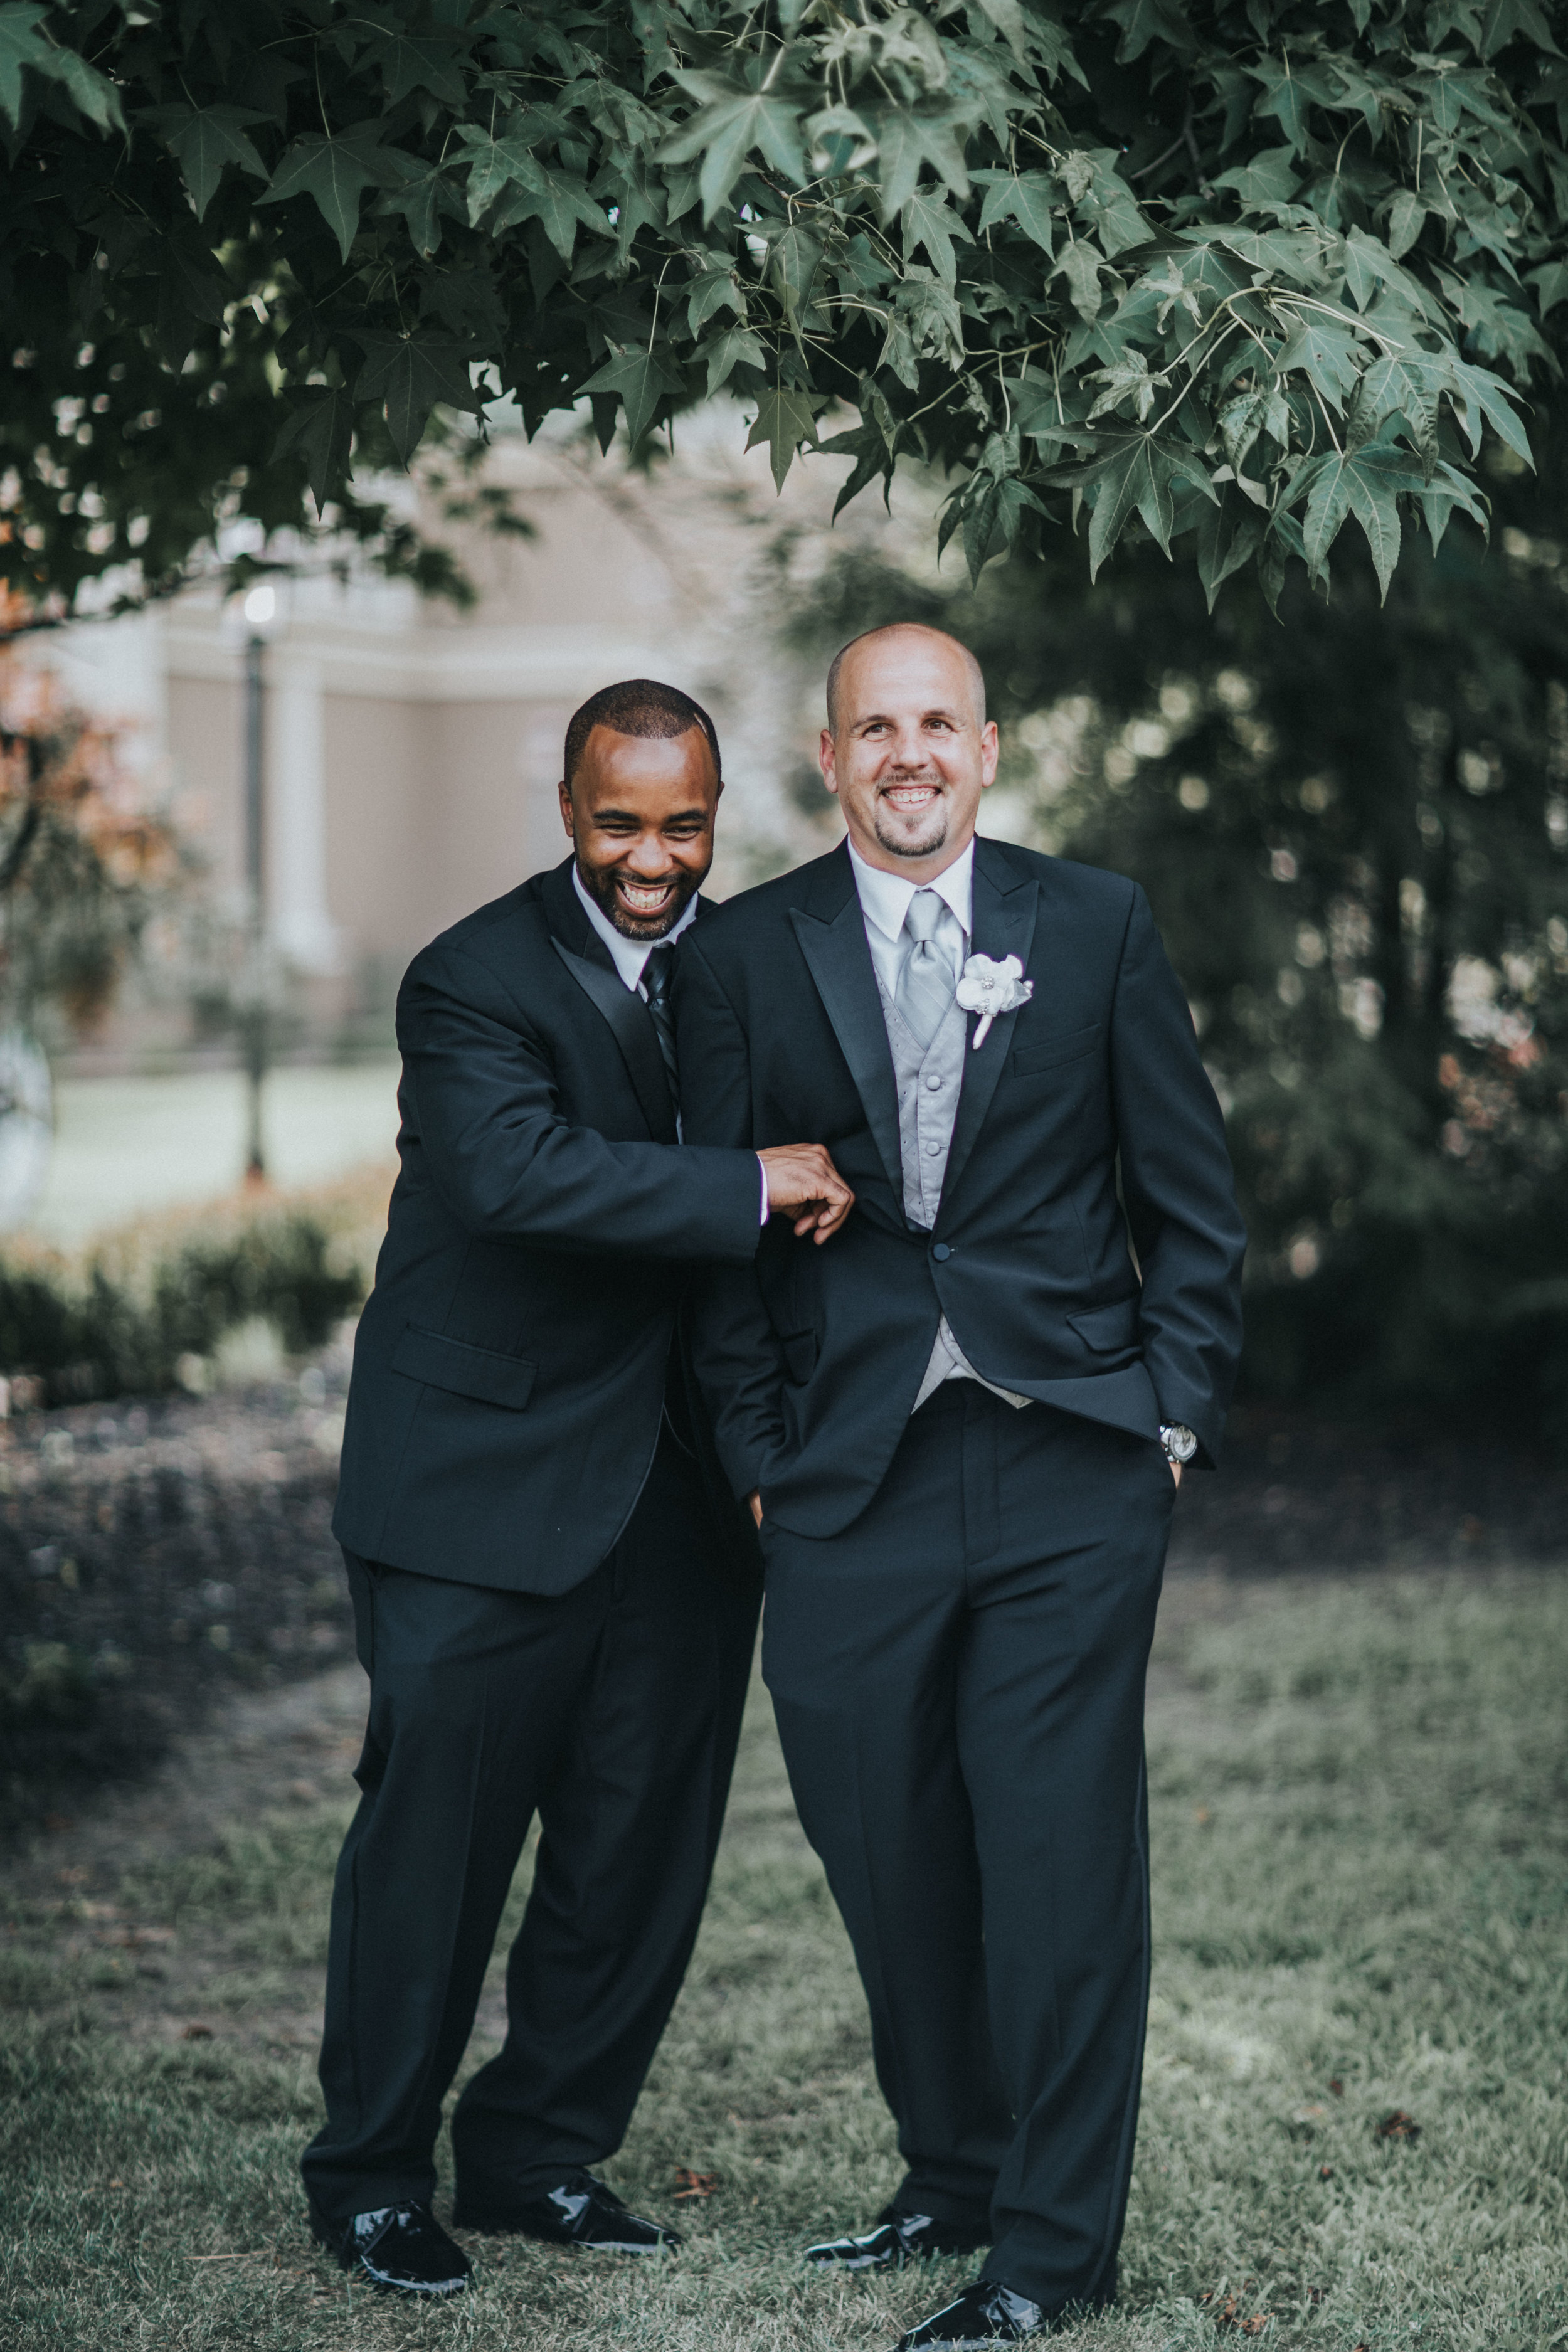 NewJersey_Wedding_Photography_Brigalias_Bridal_Party_Tara&Pete-23.jpg